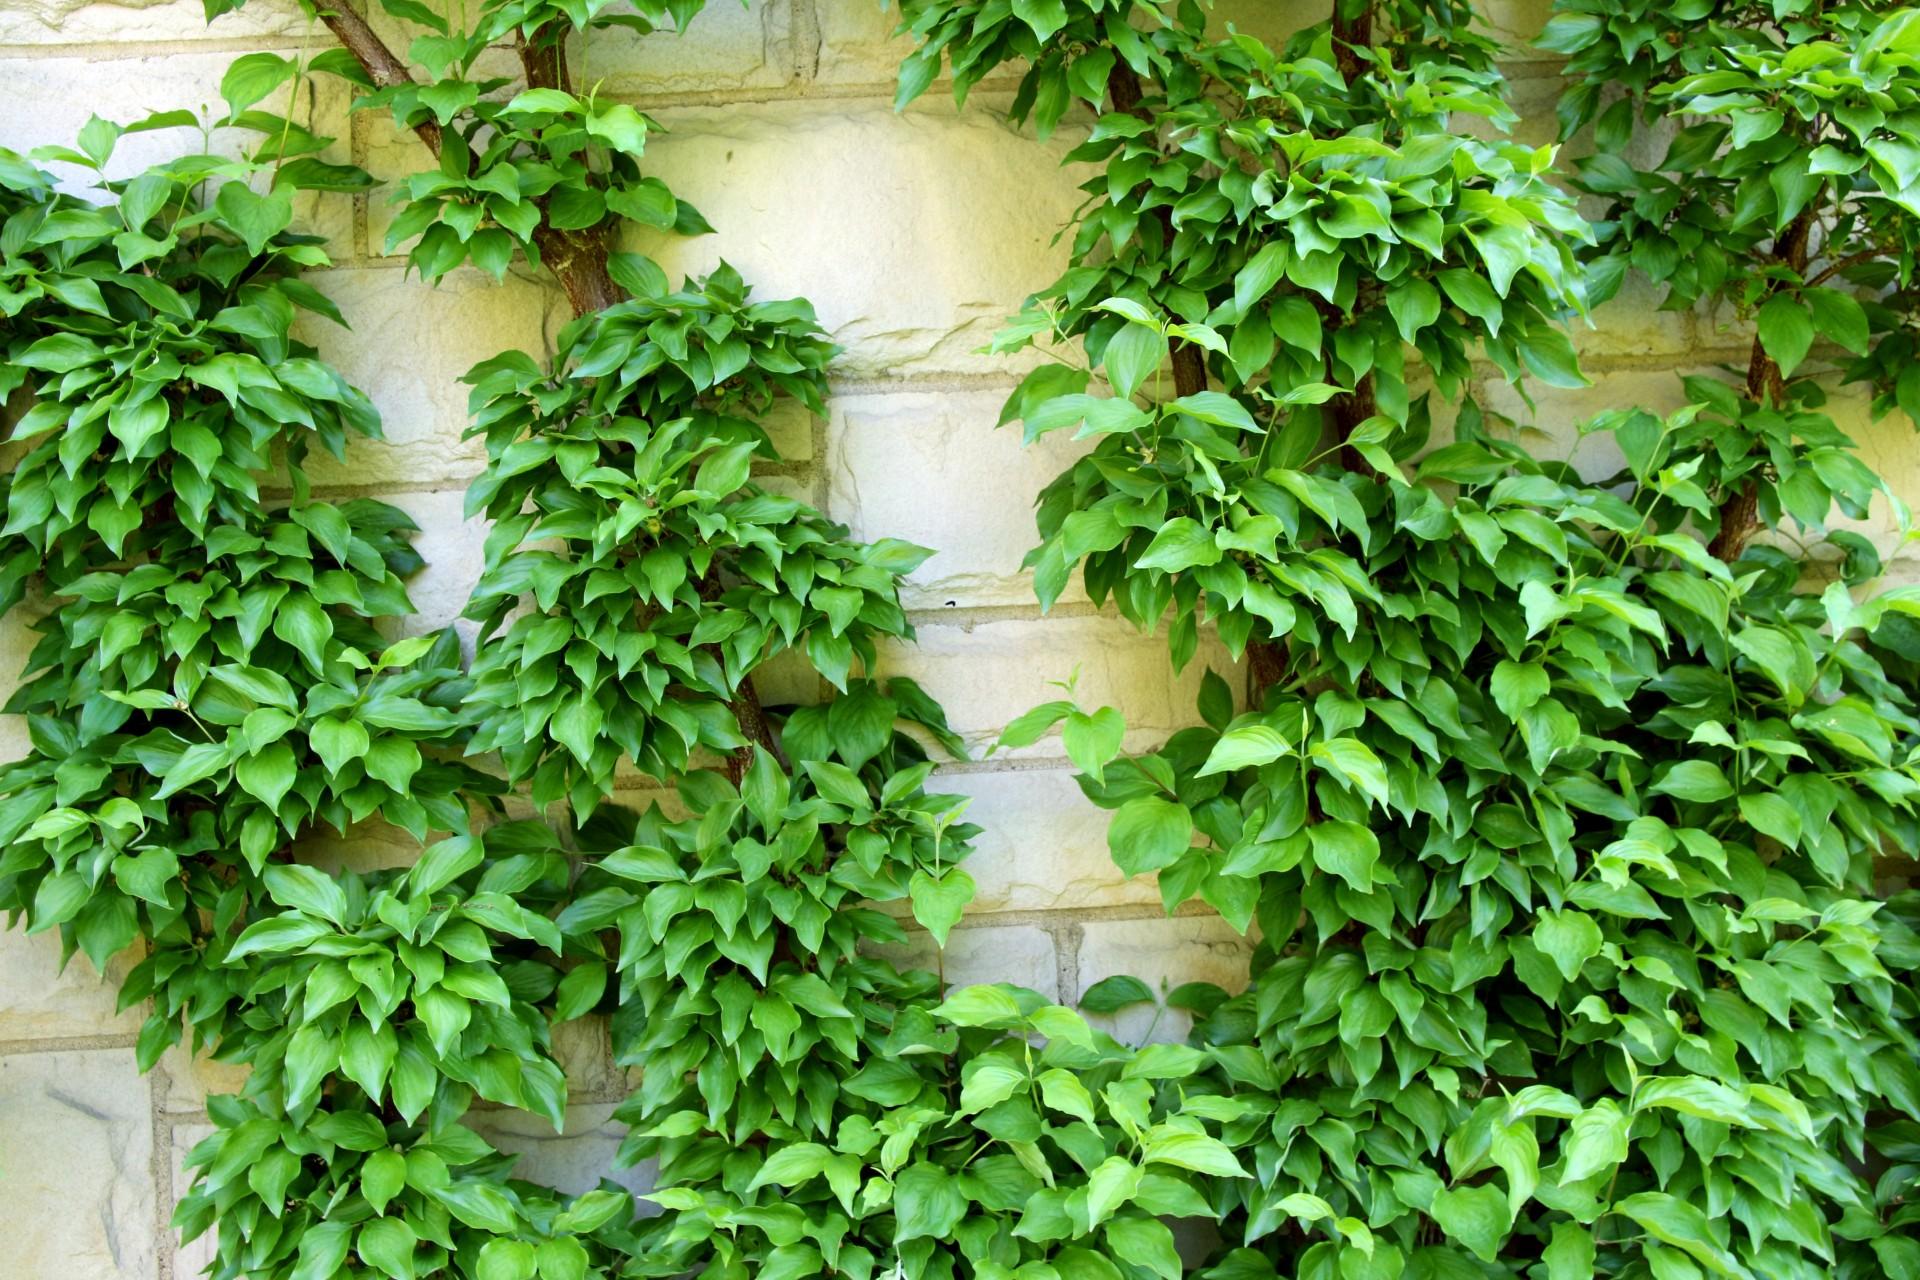 La enredadera se planta en primavera